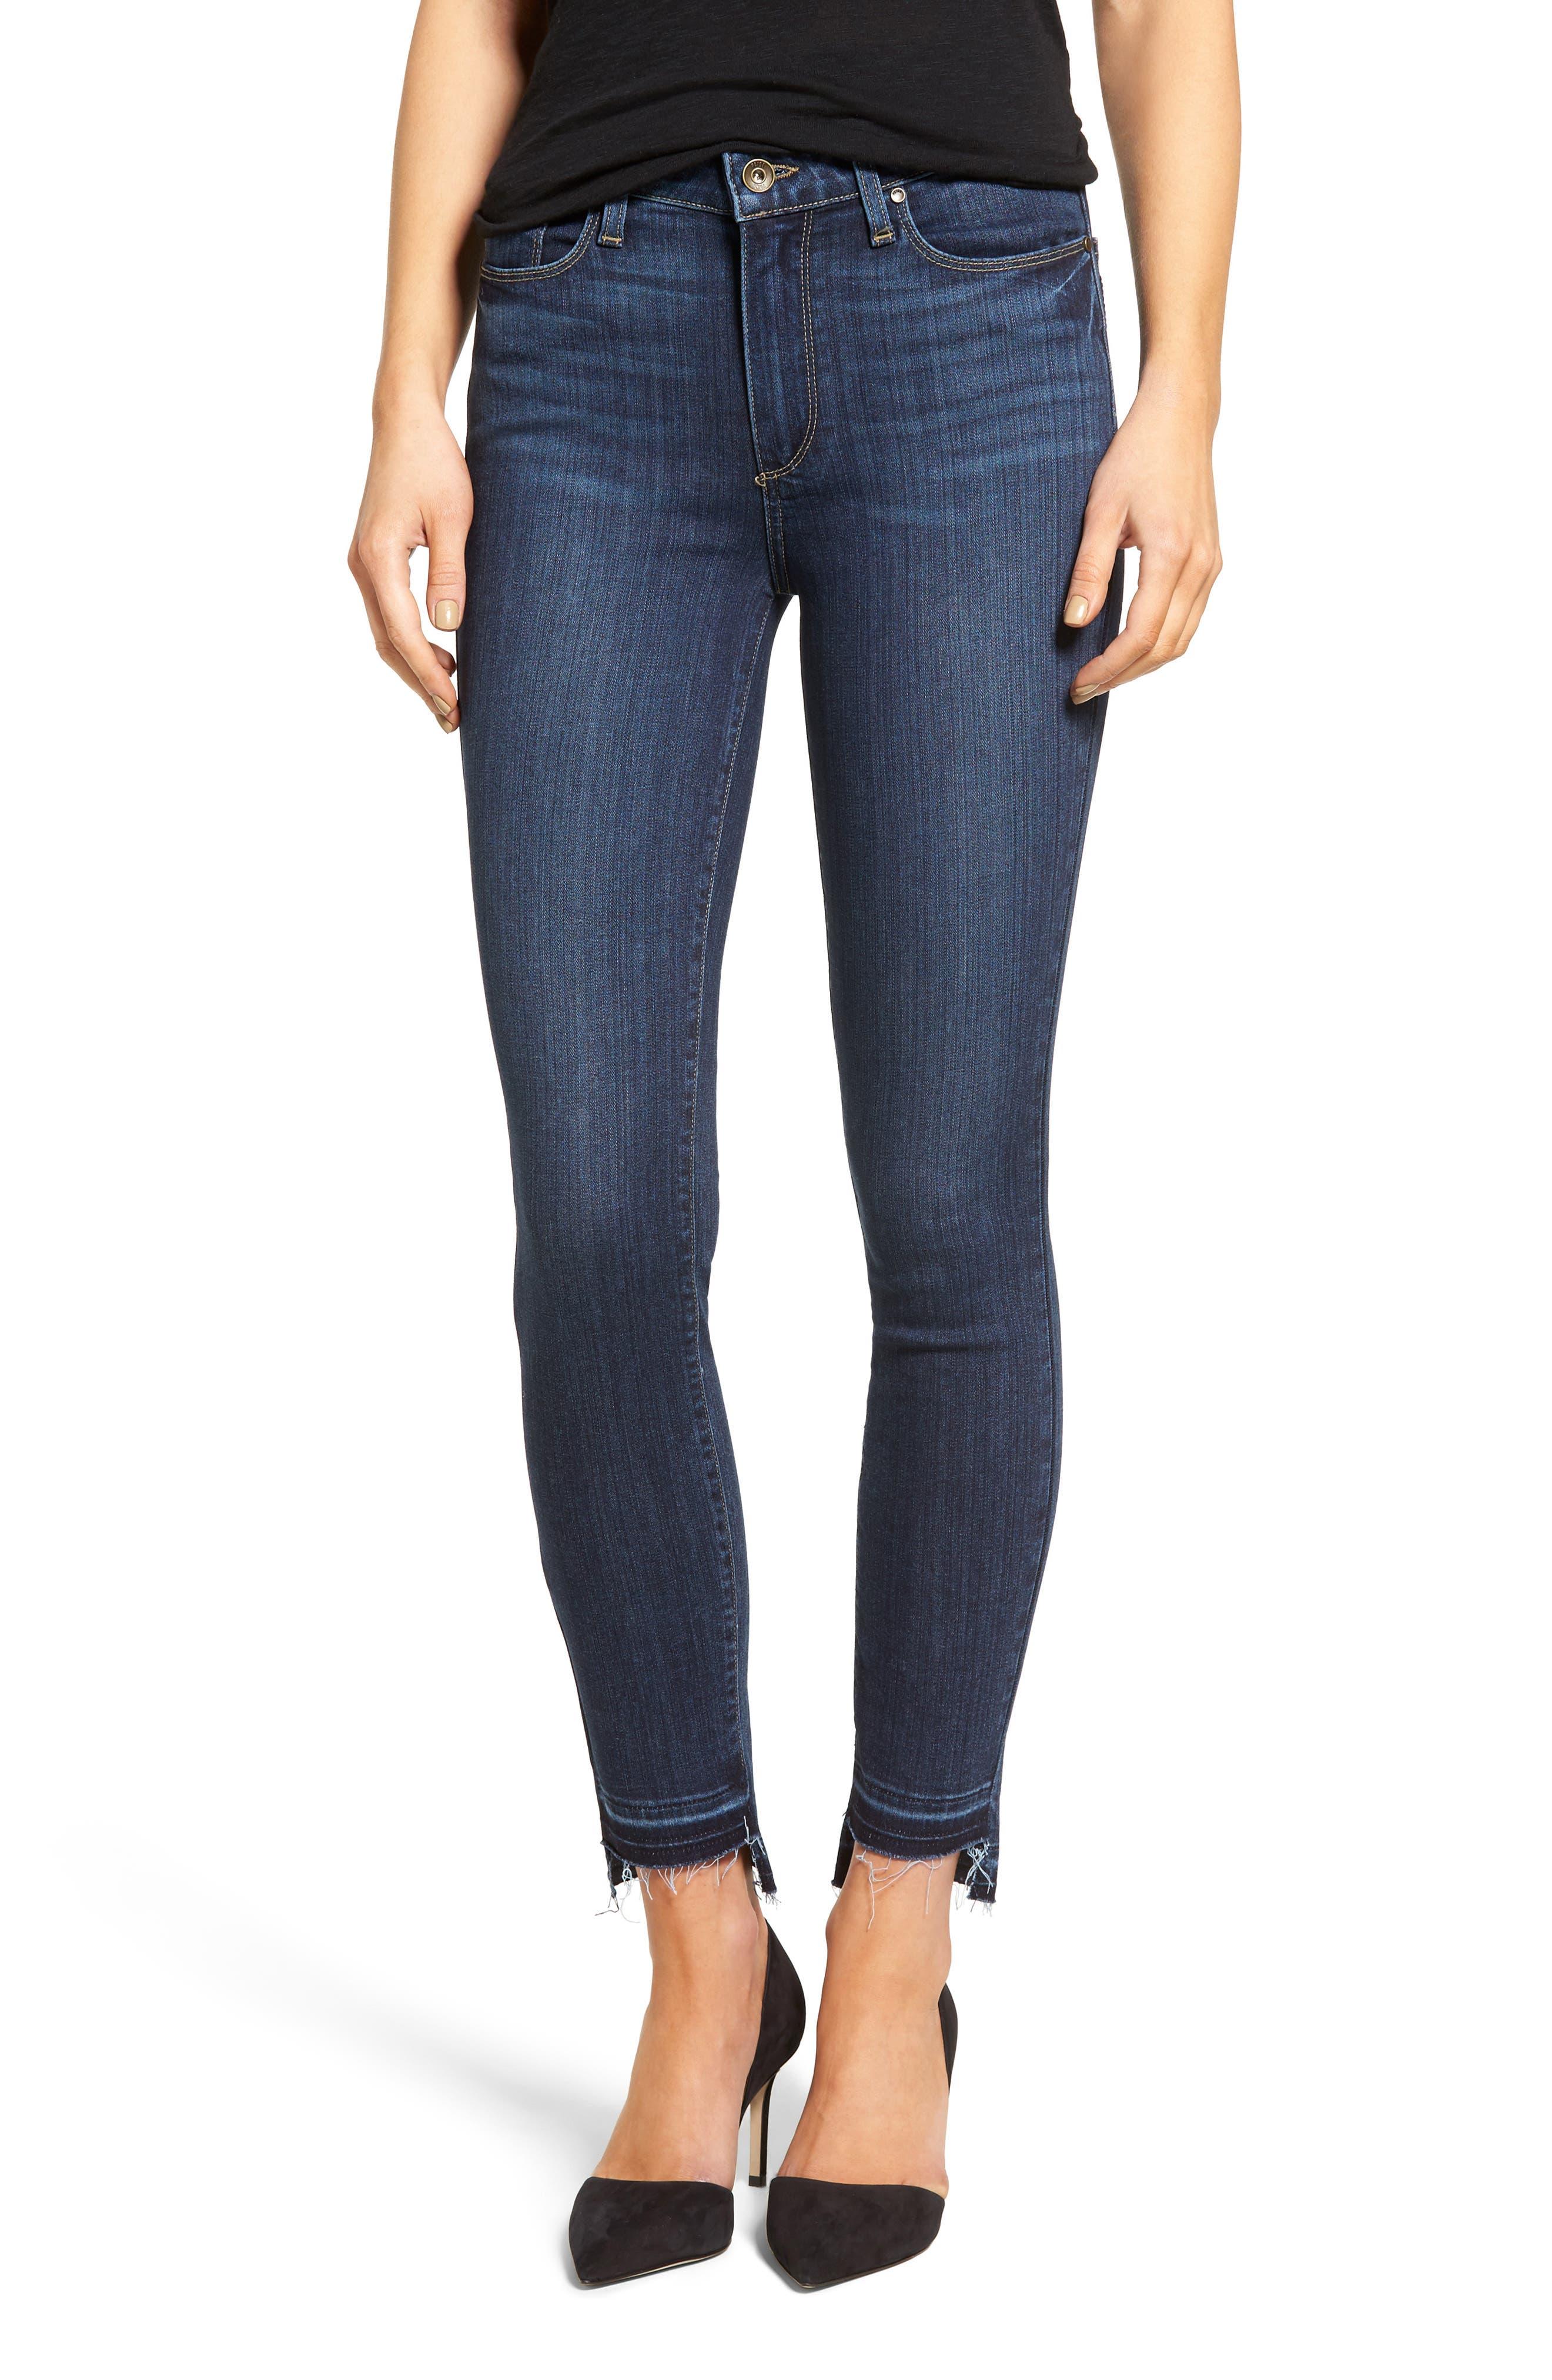 Hoxton High Waist Skinny Jeans,                             Main thumbnail 1, color,                             400